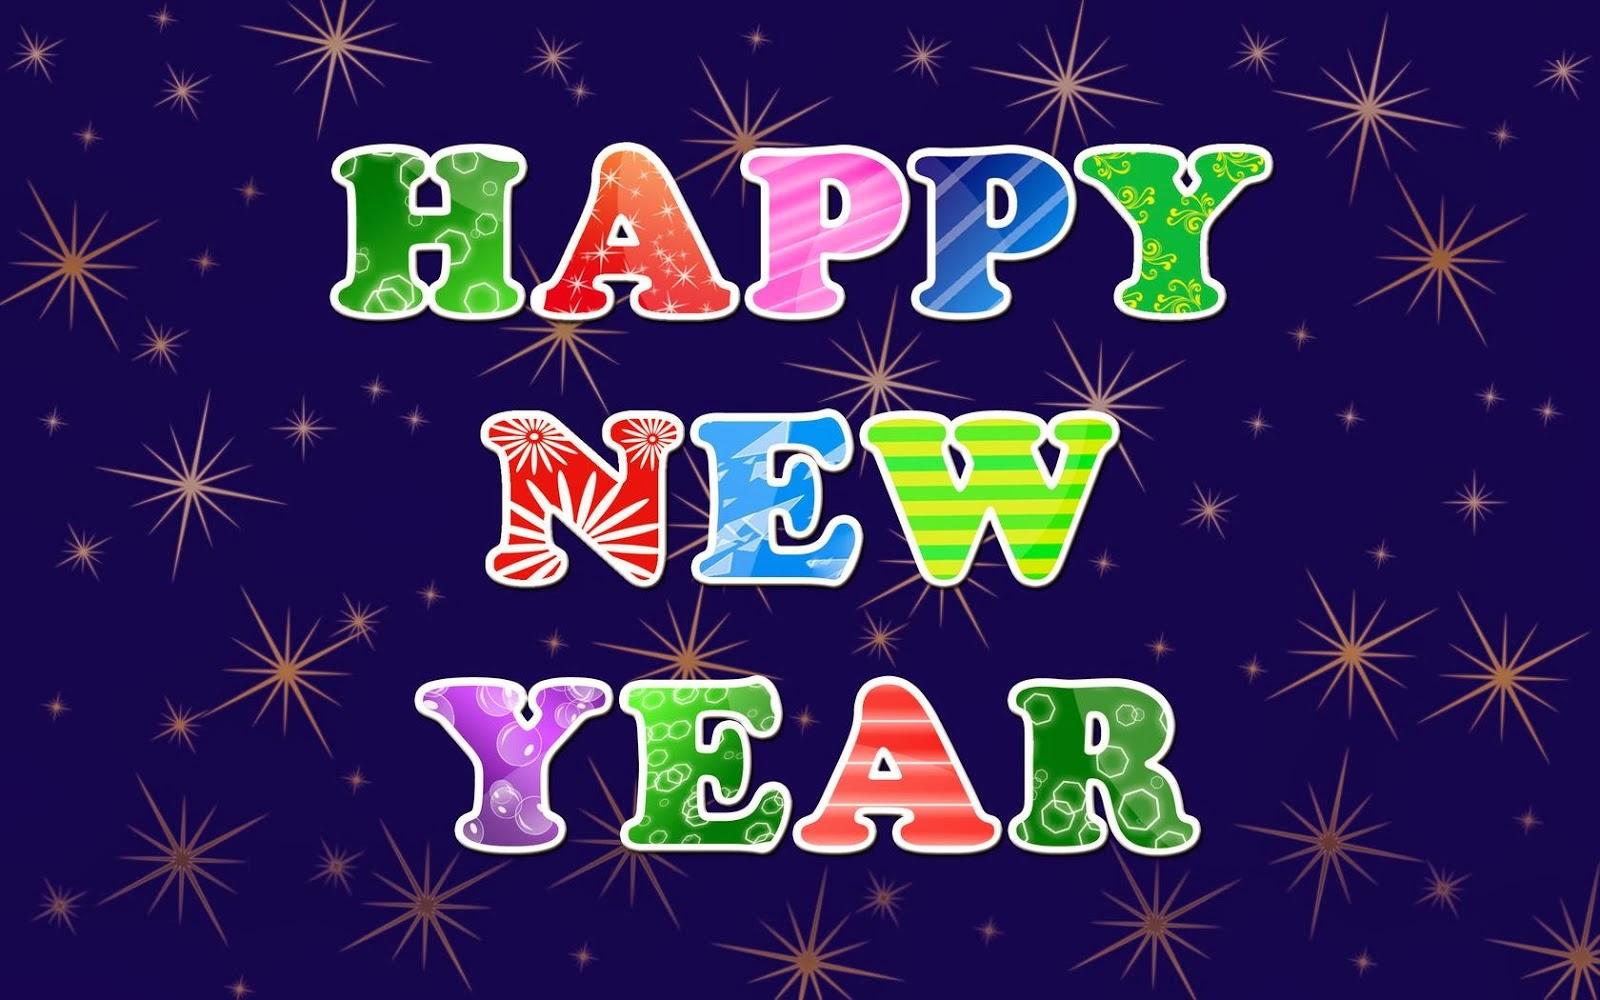 Happy-New-Year-2014-Happy-New-Year-2014-SMs-2014-New-Year-Pictures-New-Year-Cards-New-Year-Wallpapers-New-Year-Greetings-Blak-Red-Blu-Sky-cCards-Download-Free-94